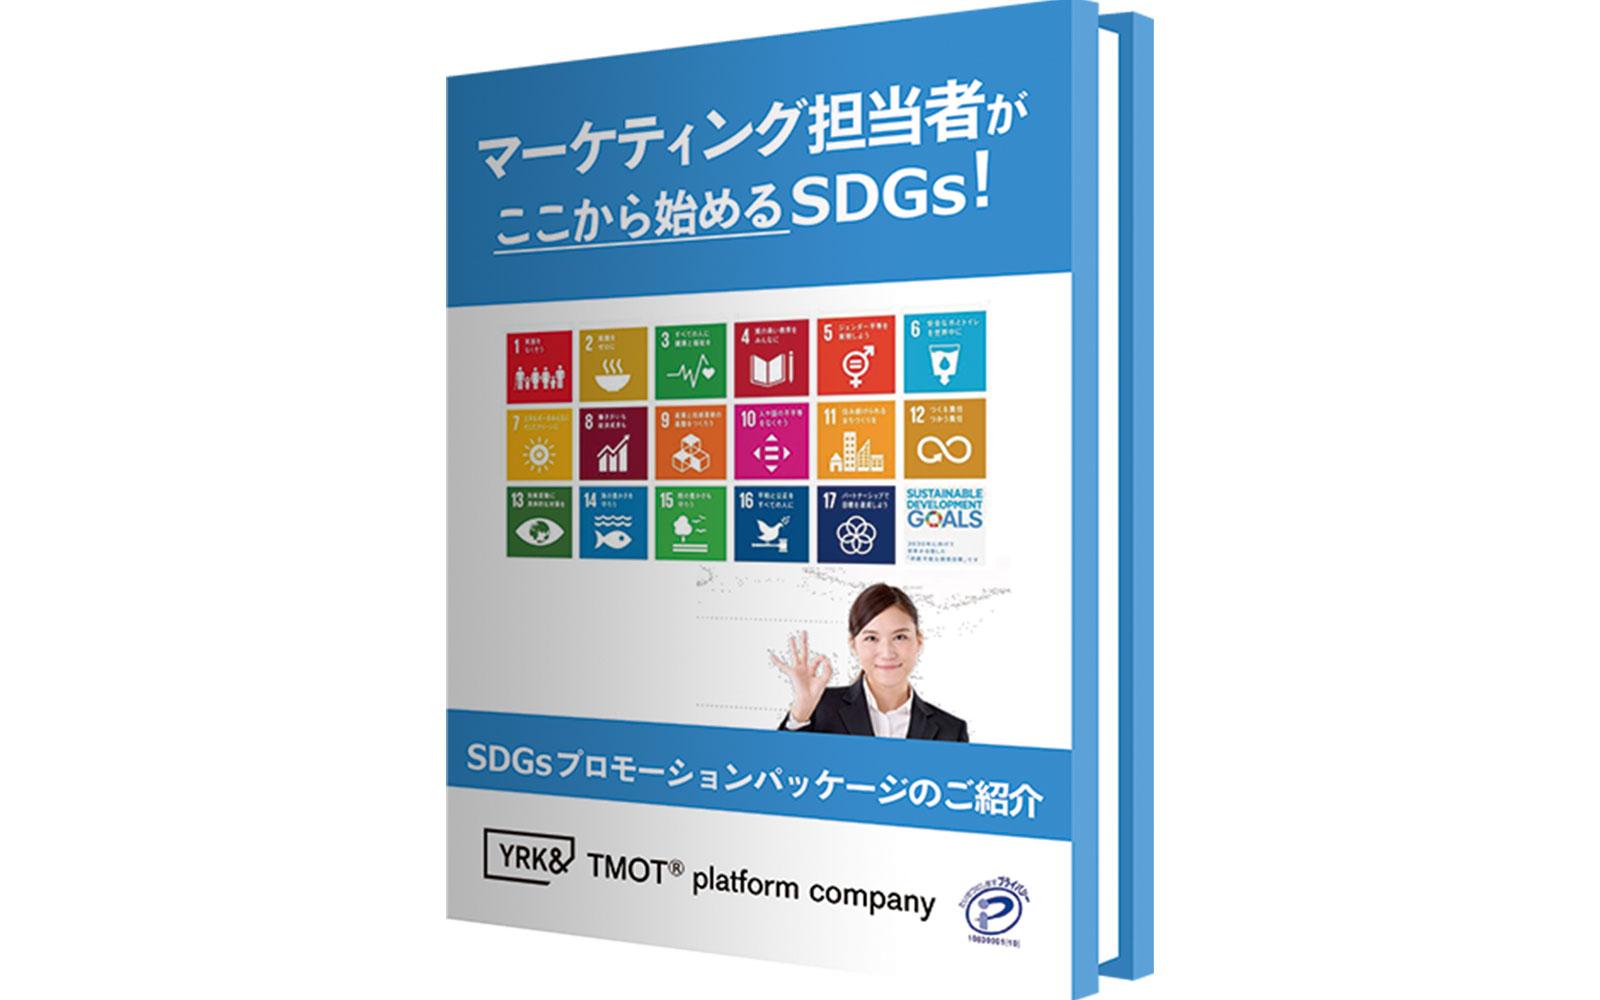 SDGsブランディング資料